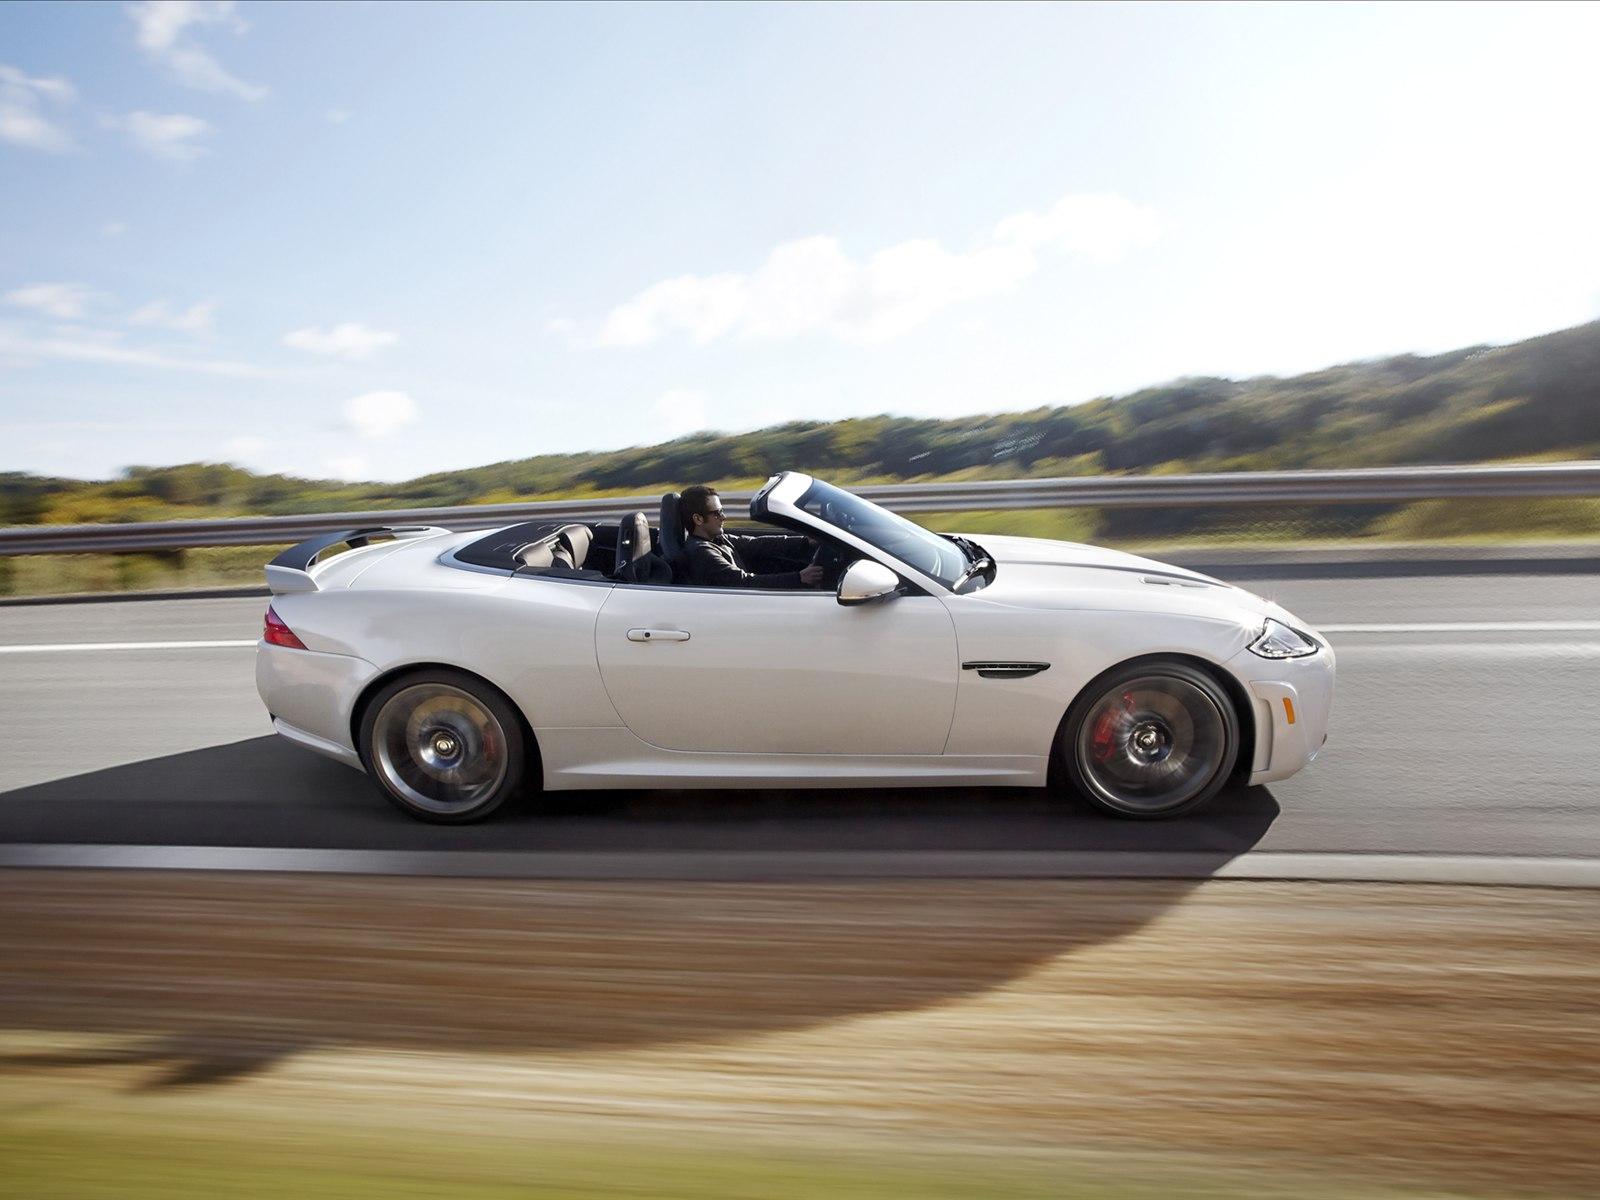 http://2.bp.blogspot.com/-sA5_u2SodLs/T_5nbmqVpQI/AAAAAAAAErM/lNwgHOBwObE/s1600/Jaguar+XKR-S+Convertible+2012_5.jpg